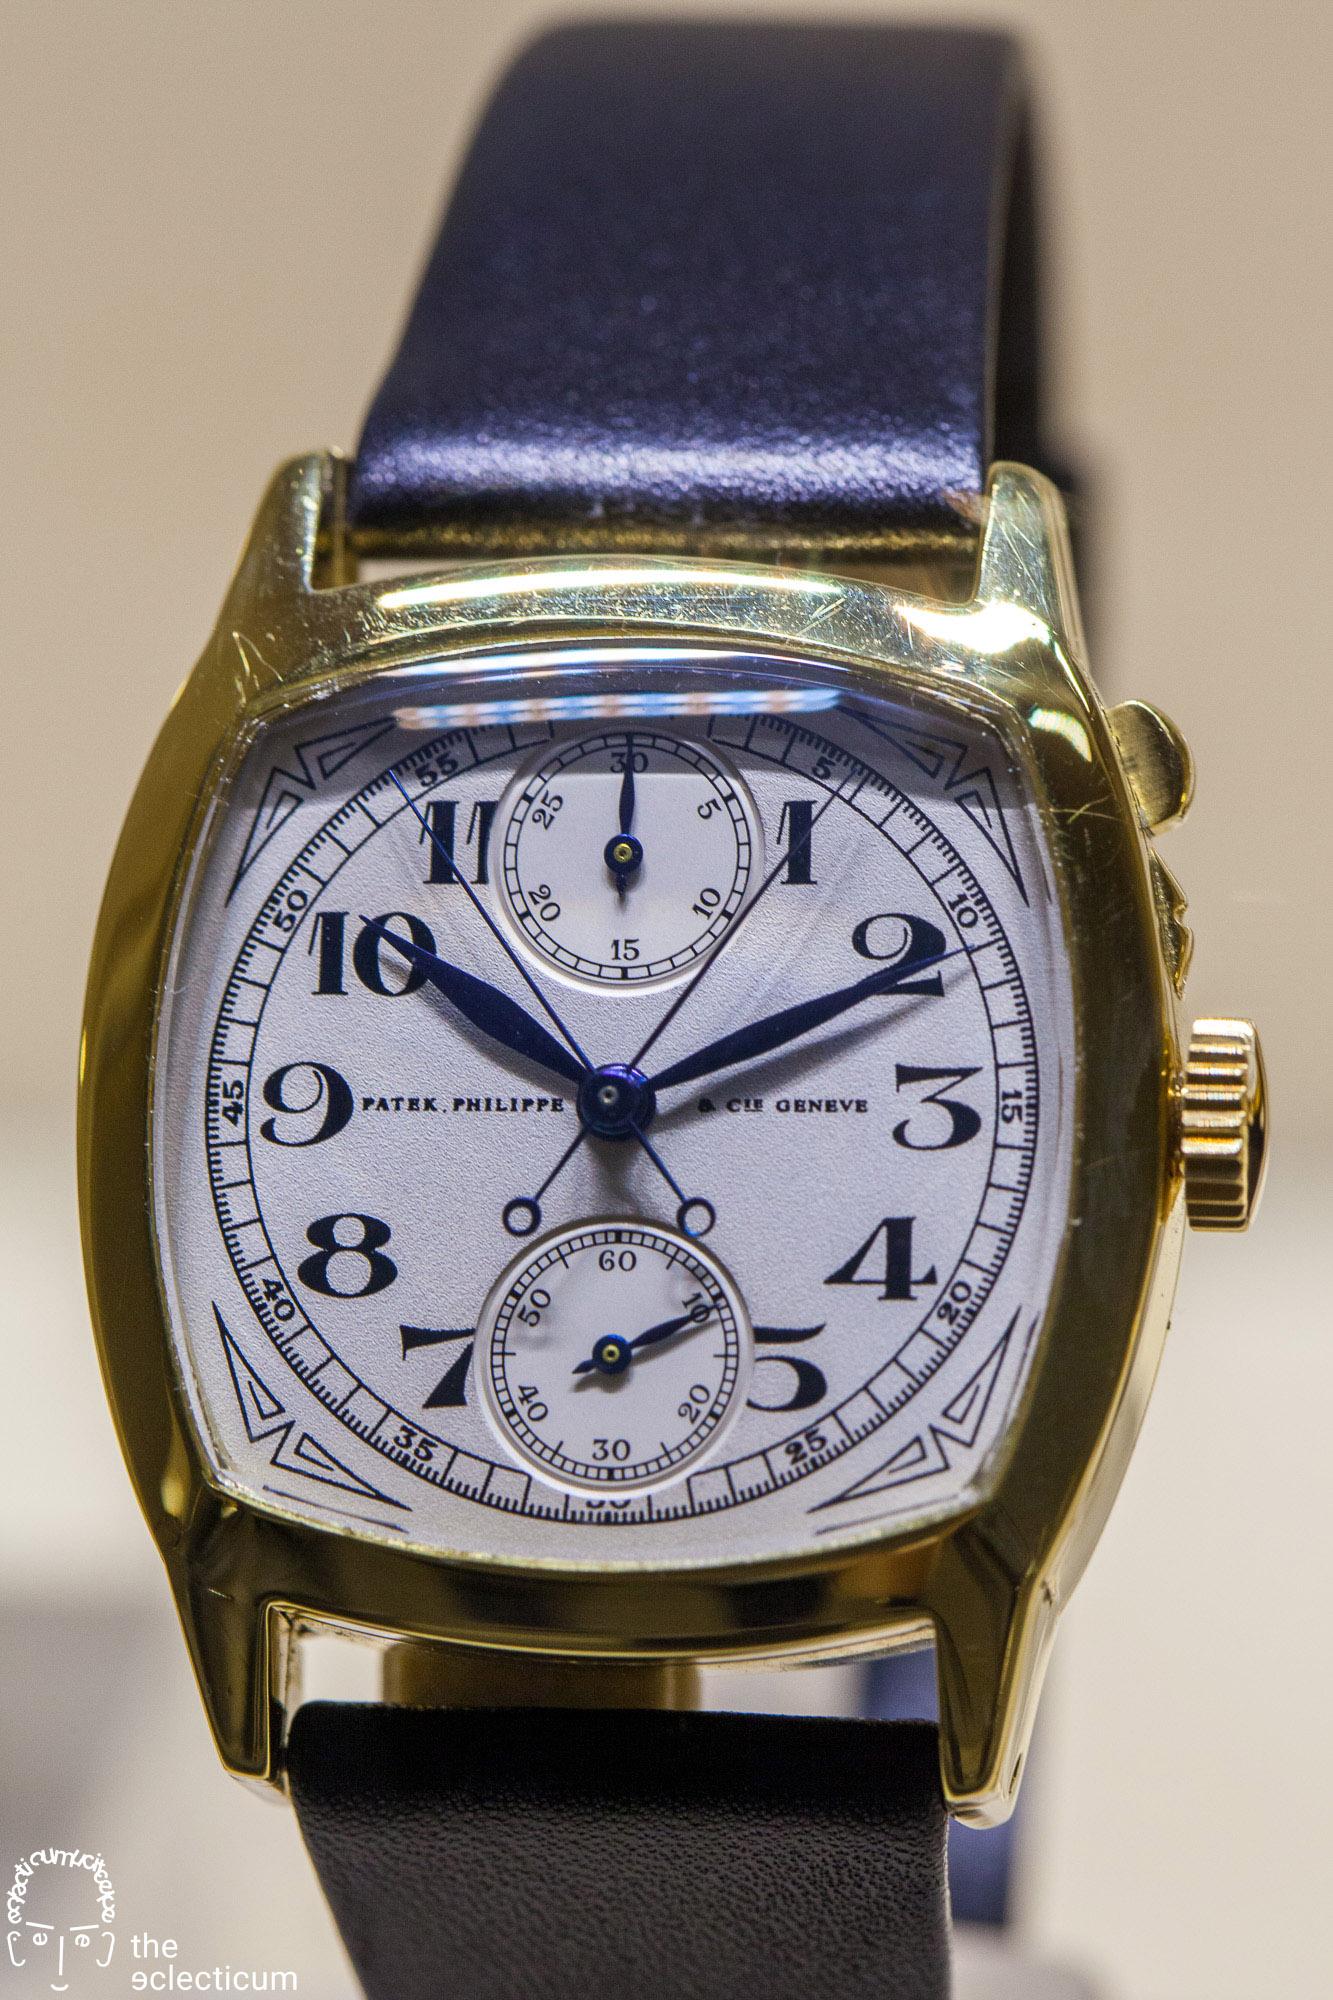 Patek Philippe Split seconds chronograph rattrapante monopusher